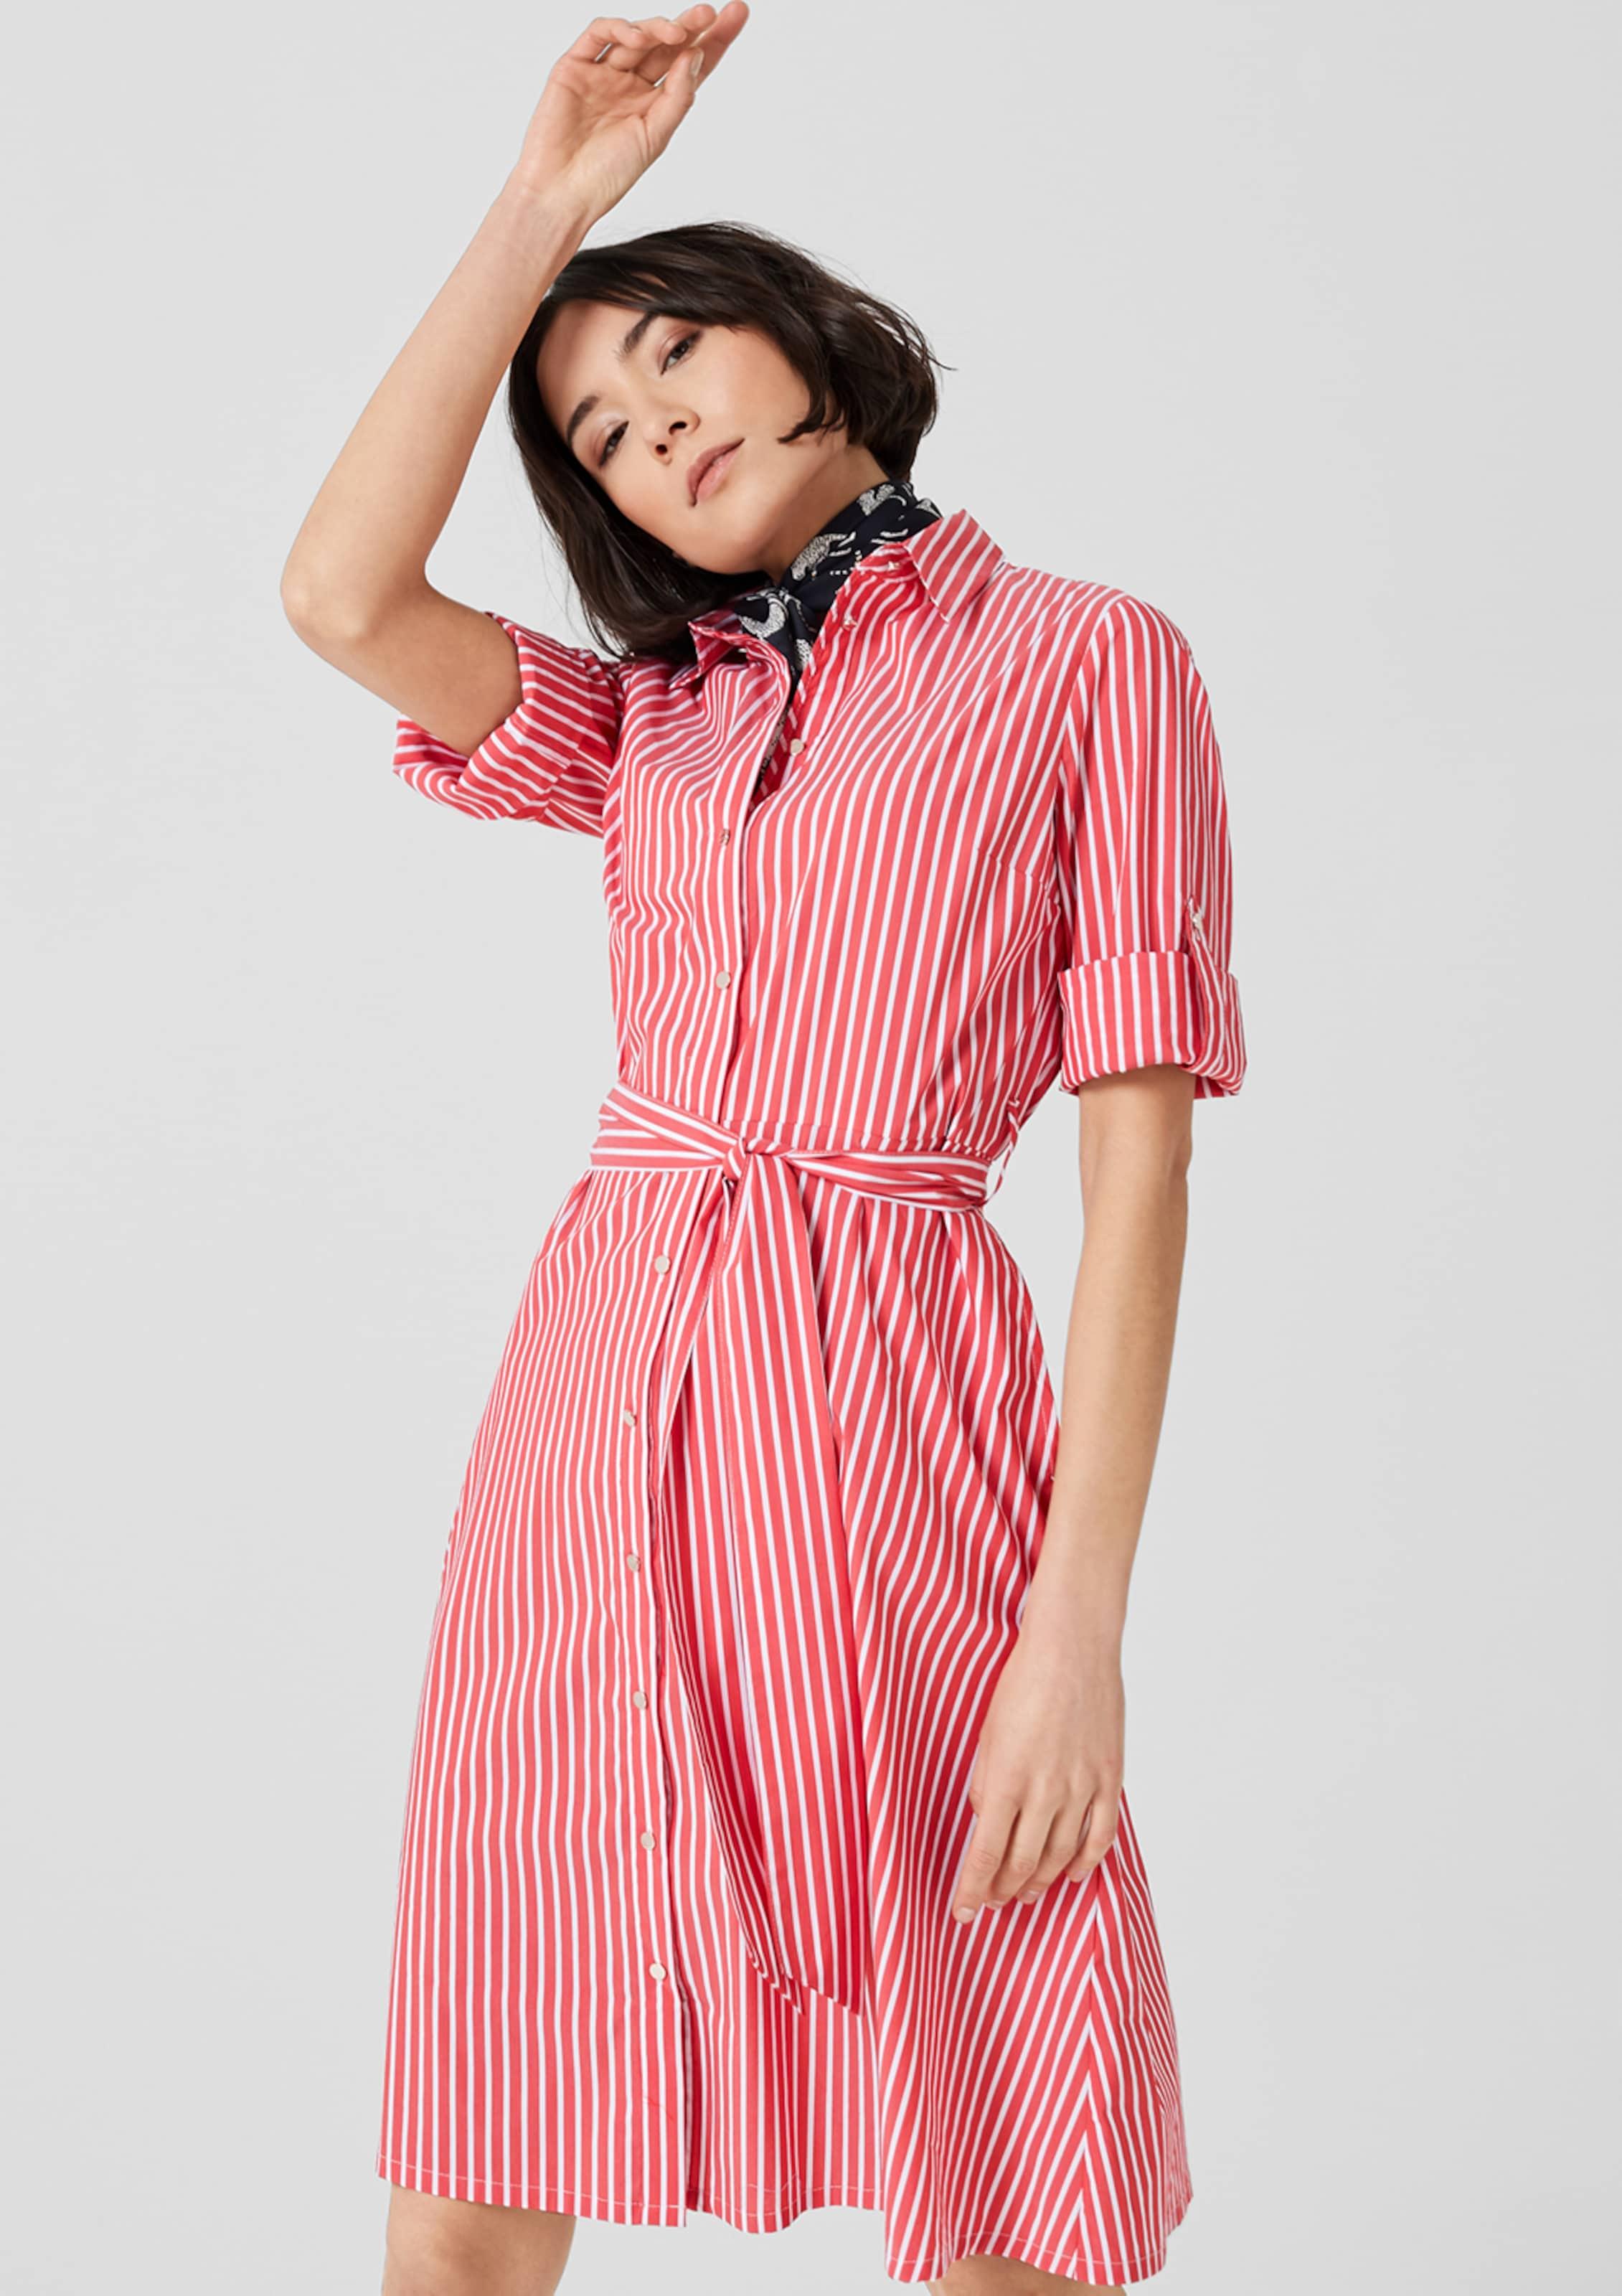 oliver RotWeiß Blusenkleid Blusenkleid In S oliver In S eWDYbHE2I9